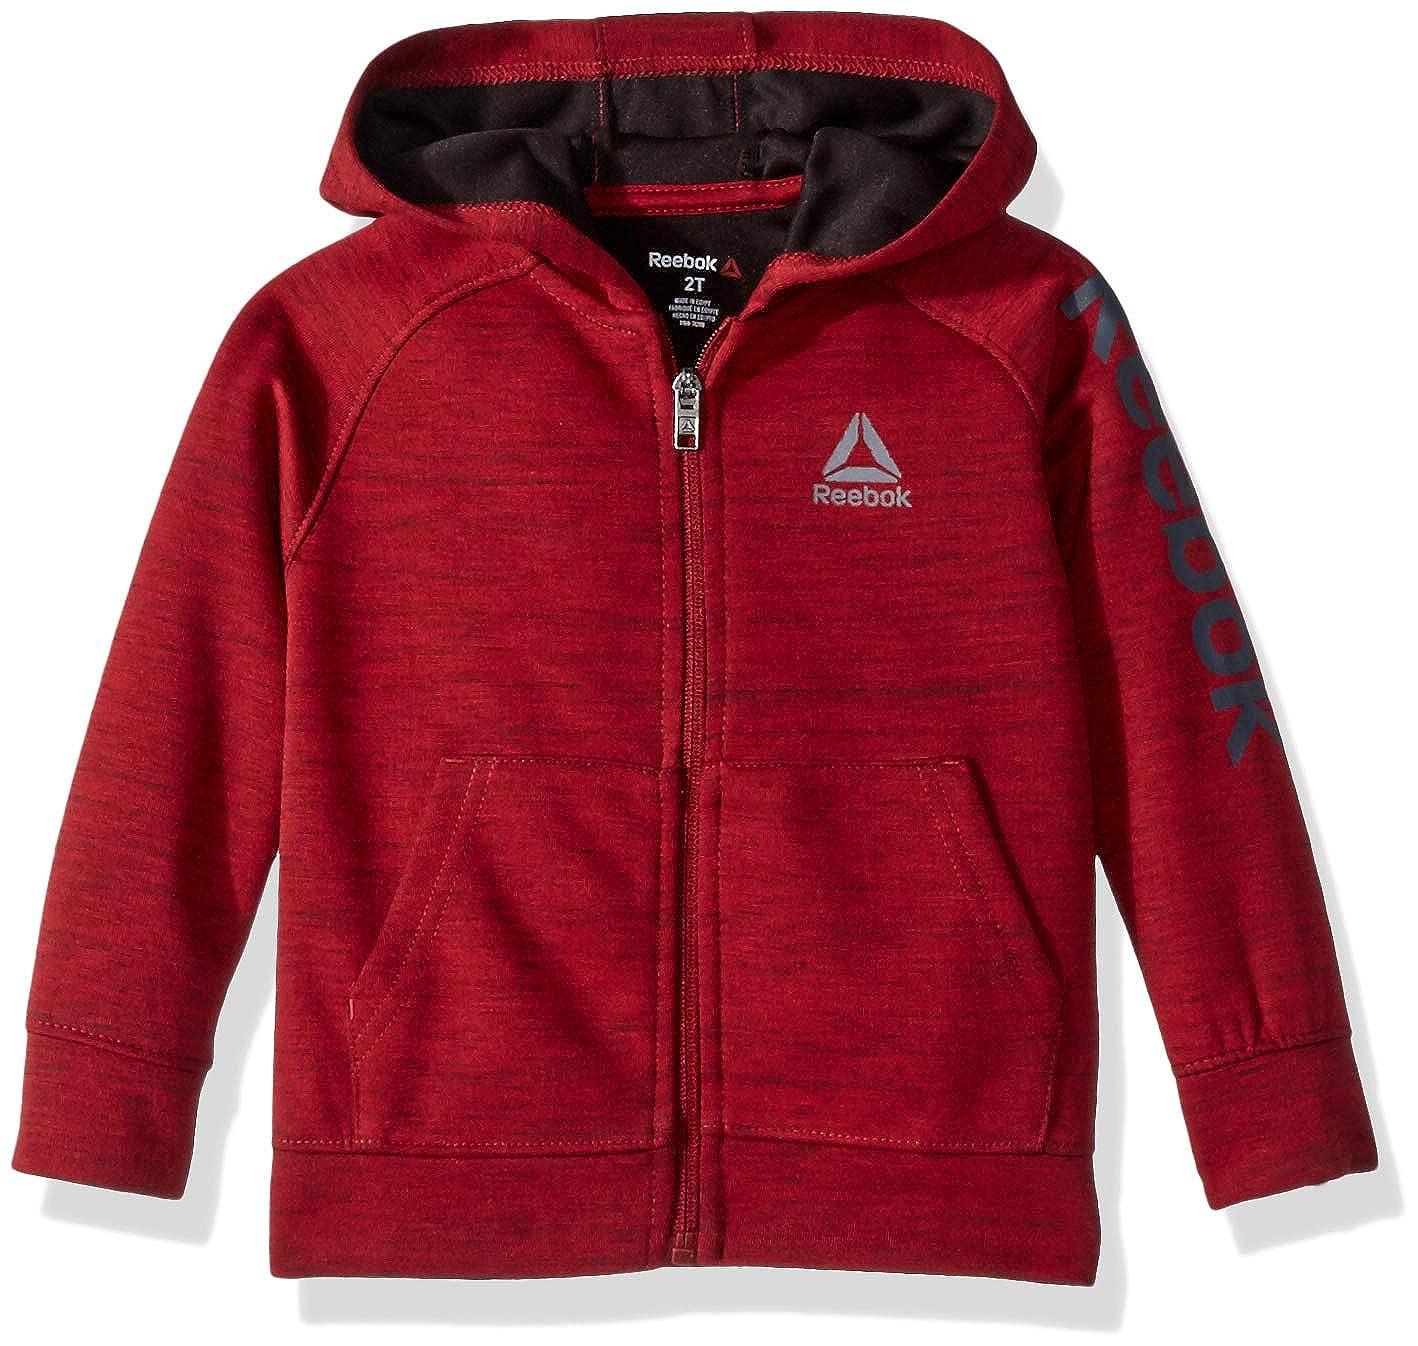 Reebok Boys Sporty Double Knit Zip-up Hooded Jacket Q/_2424